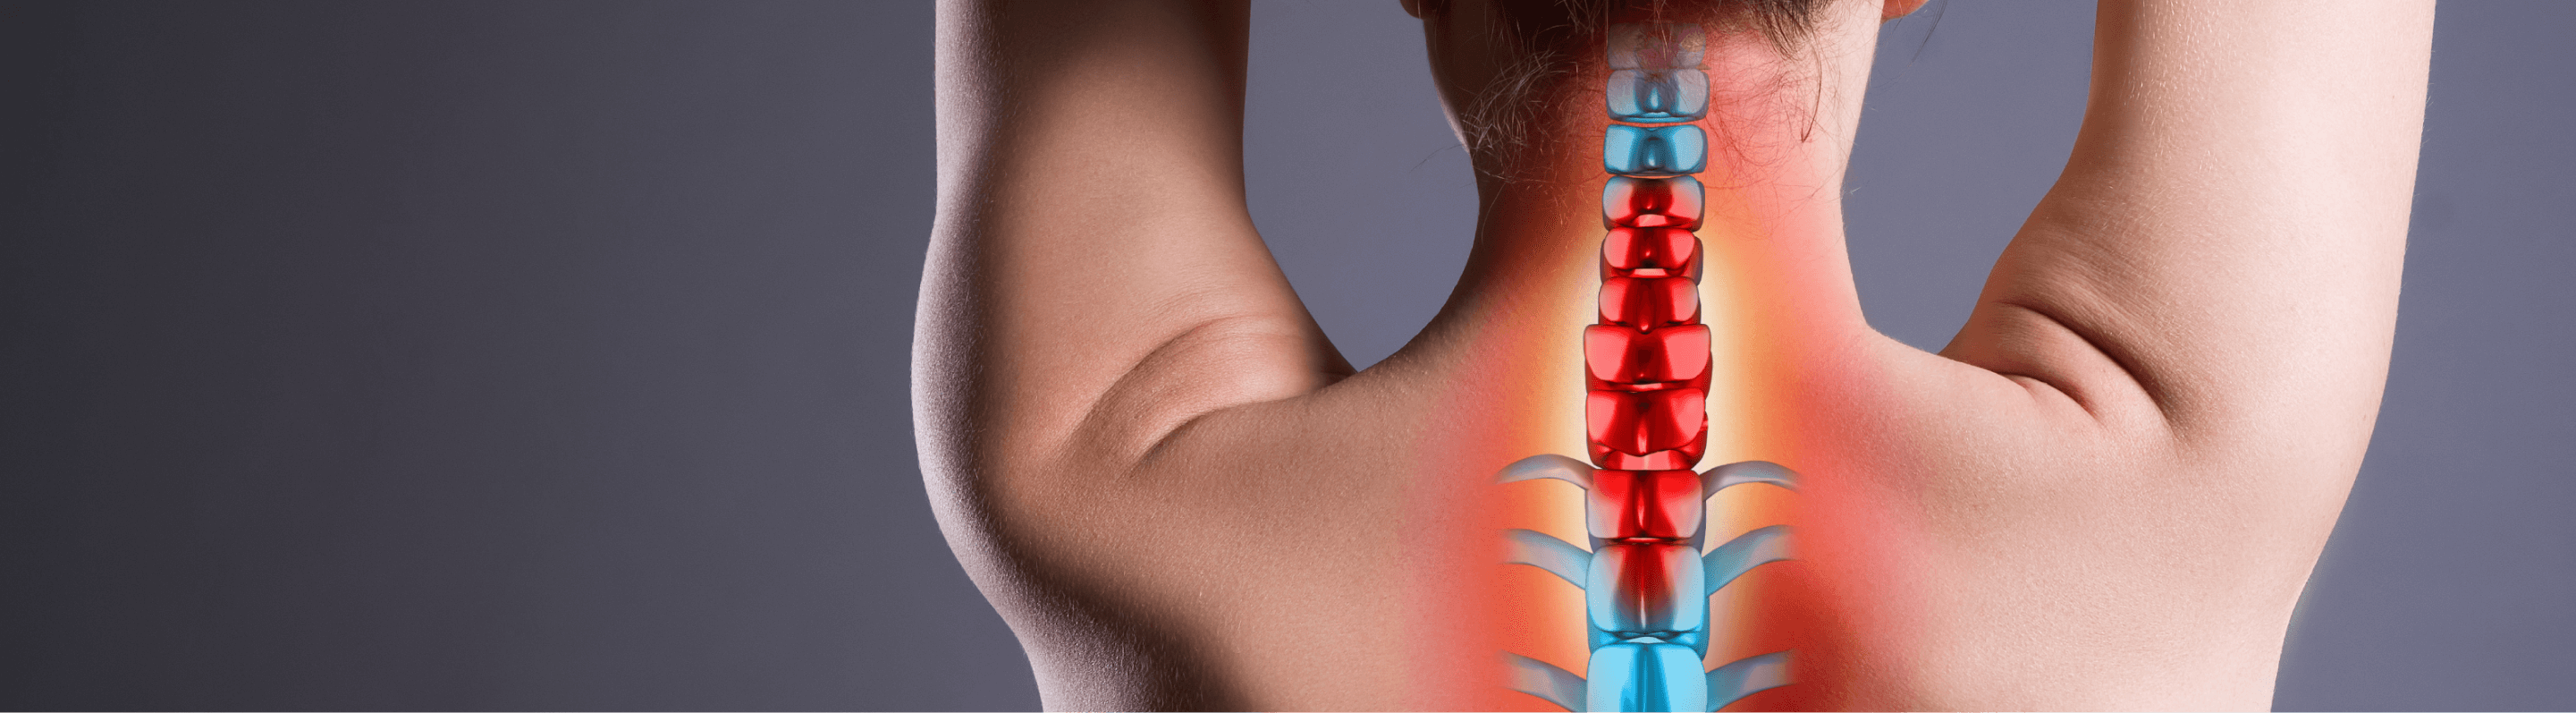 spinal arthritis treatments north houston